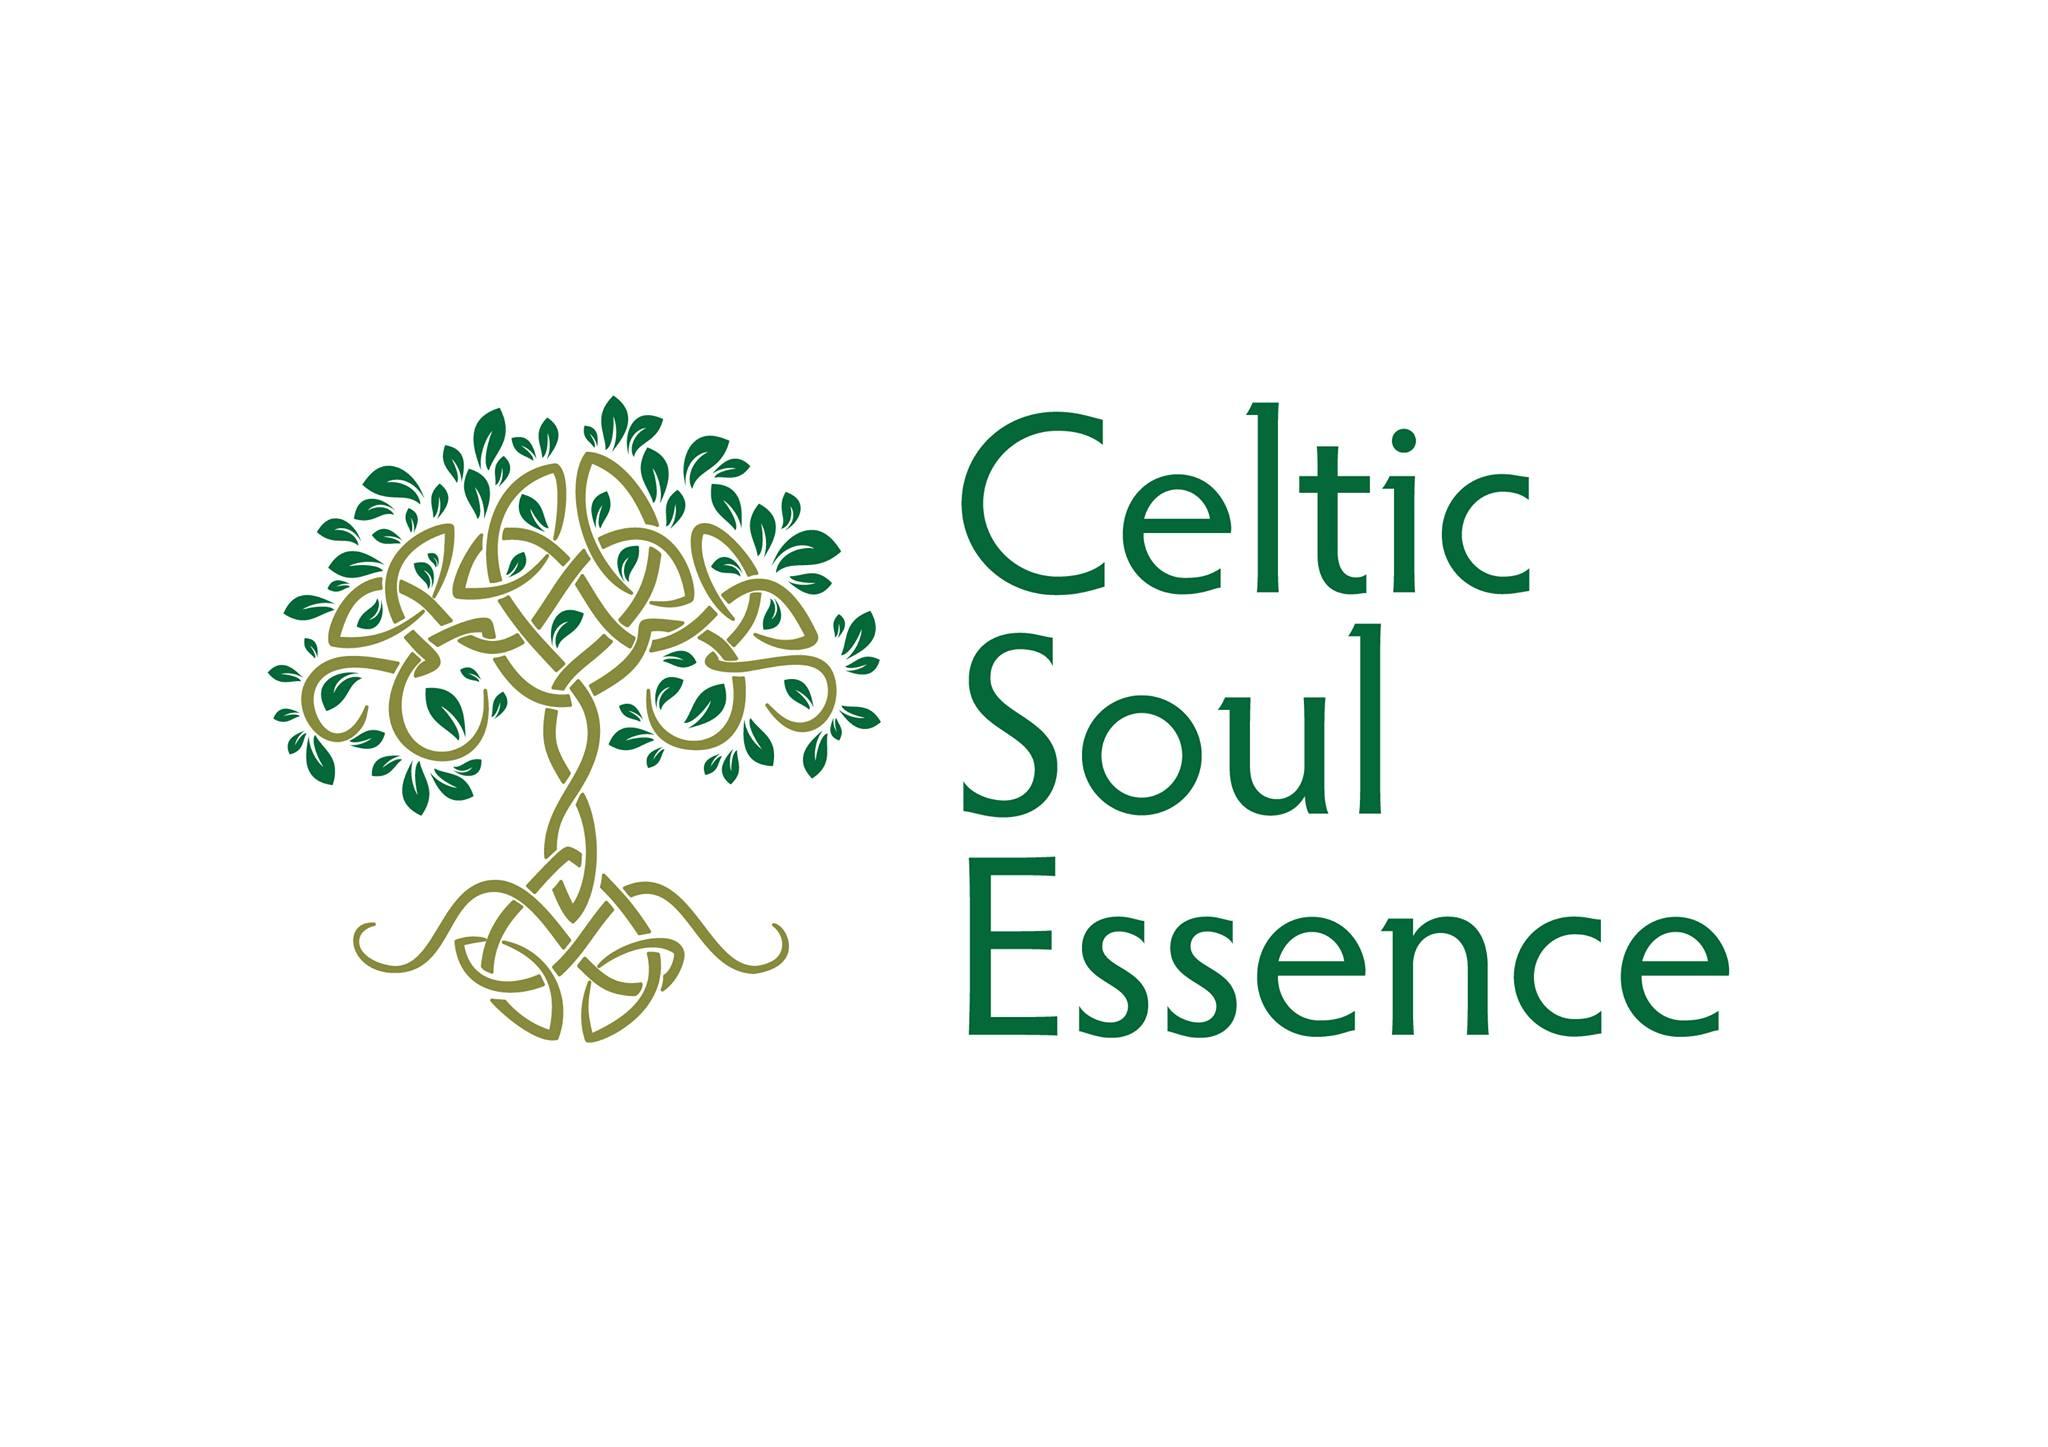 Celtic Soul Essence